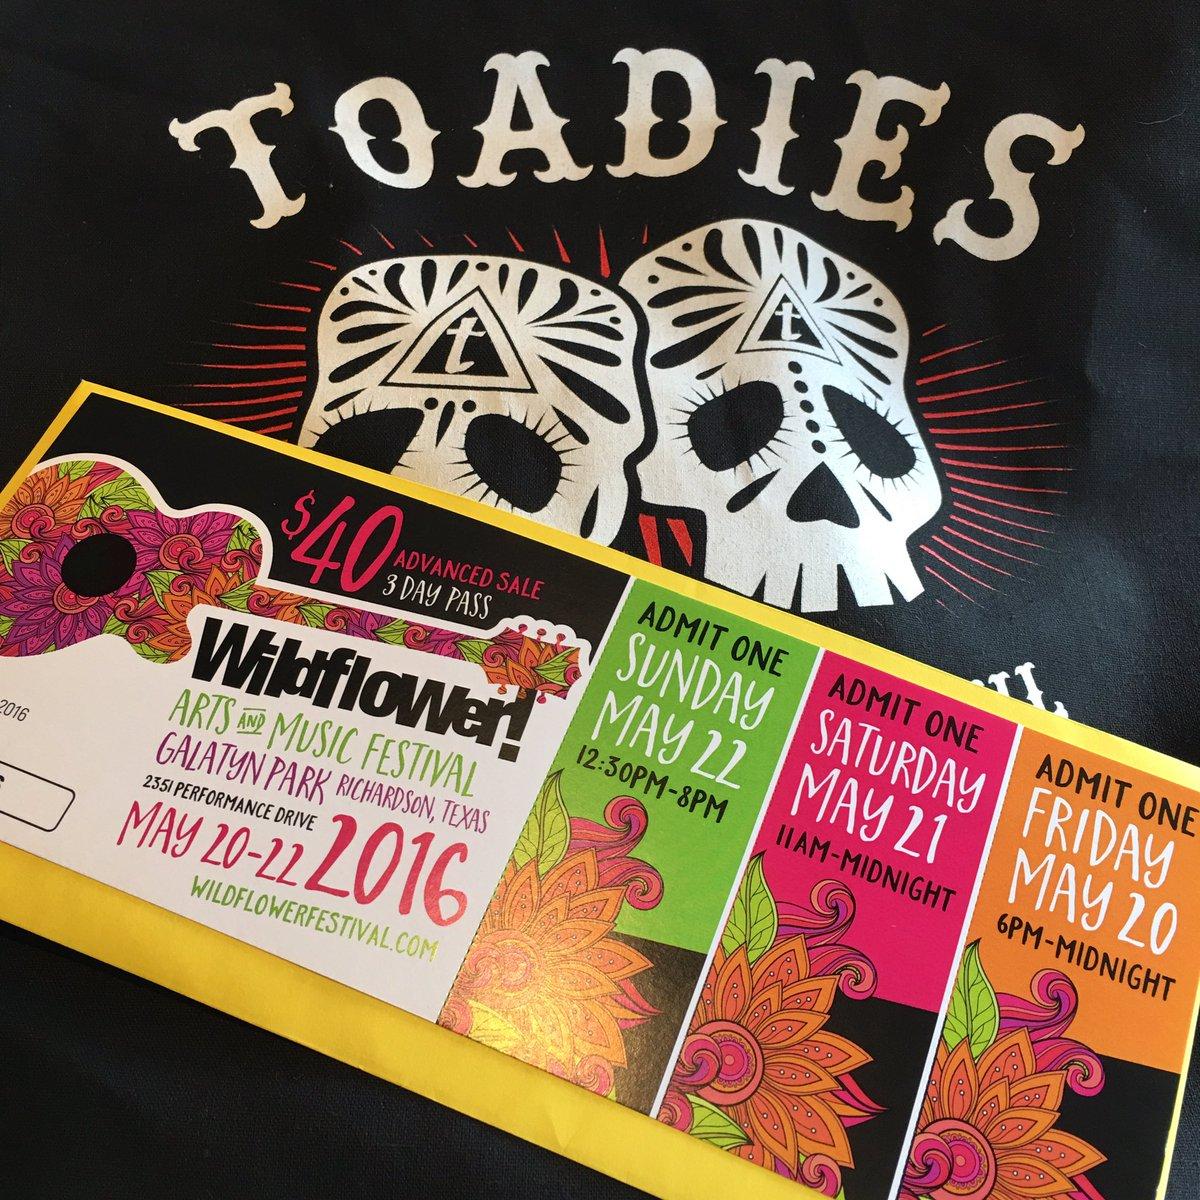 Giving away Giftpack TONIGHT to @WildflowerFest in Richardson. Musicians include @peterframpton @Hoobastank